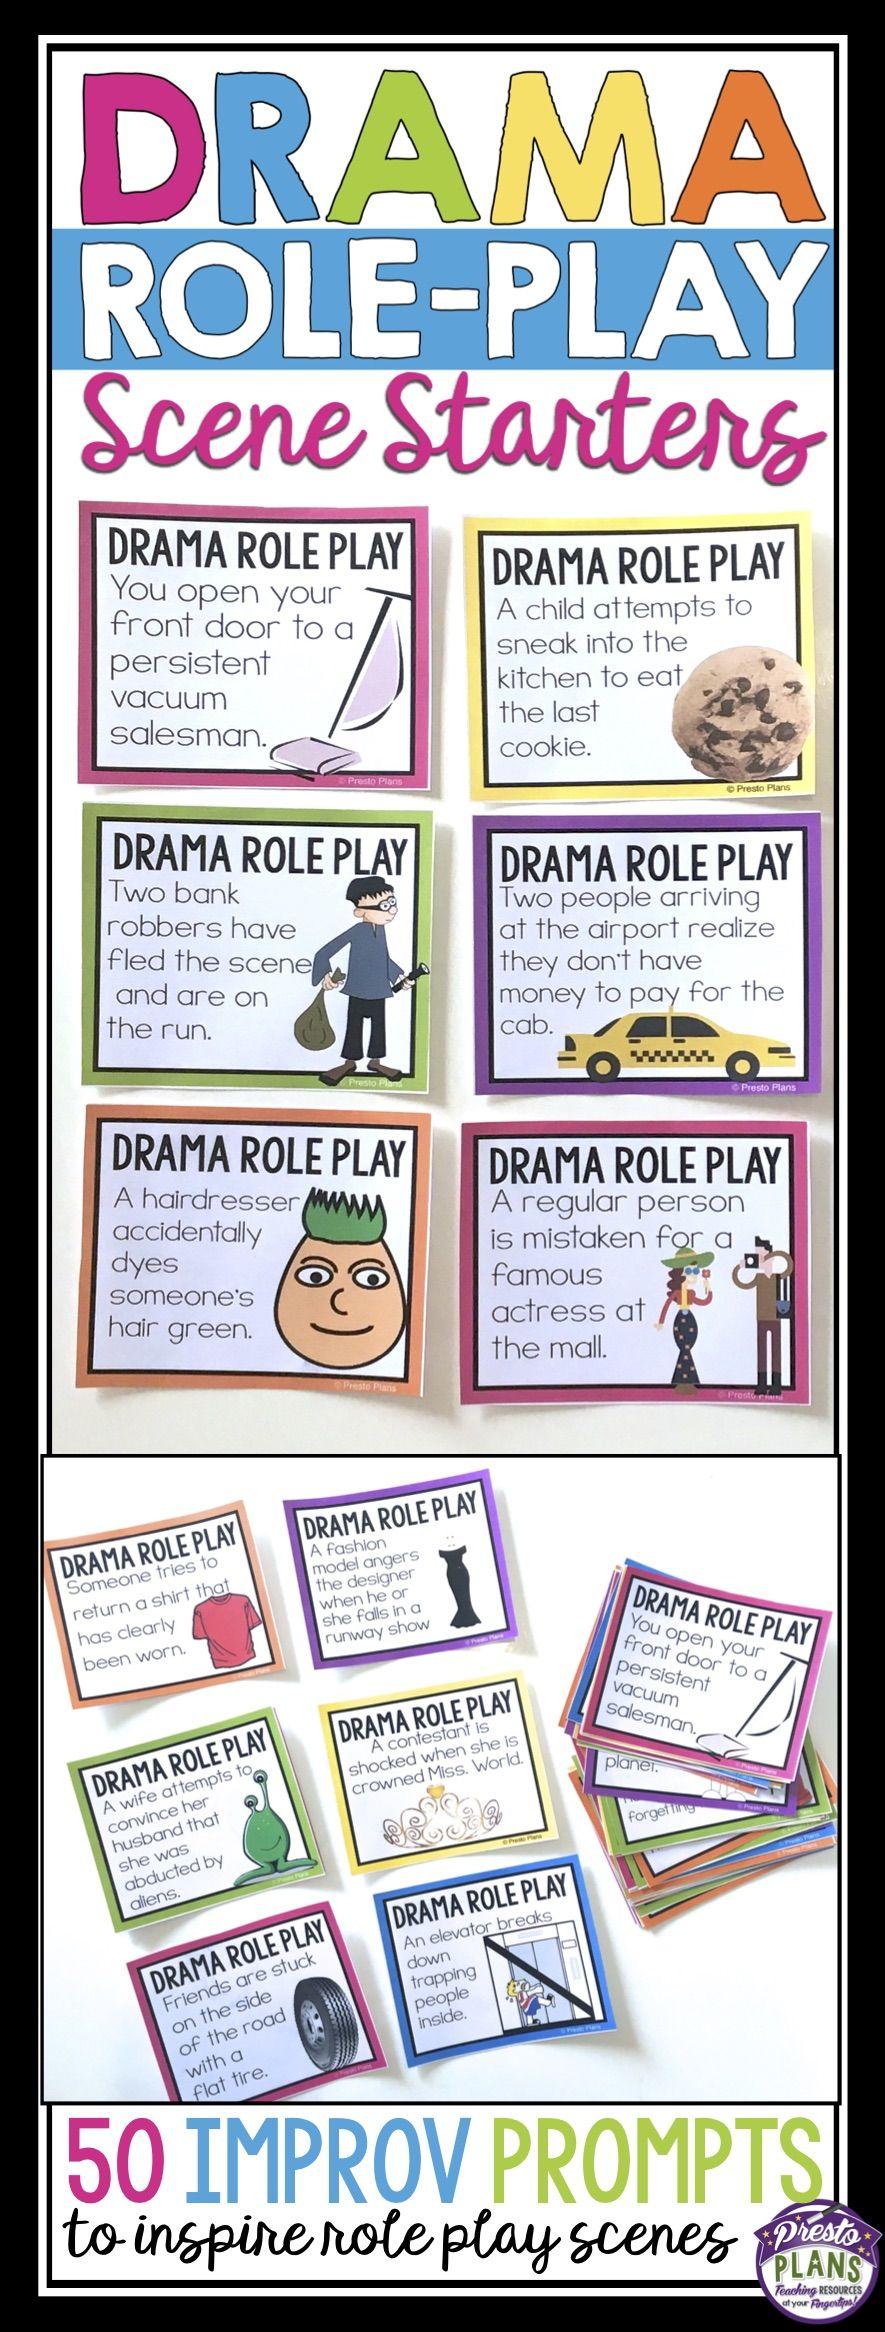 Acting improvisation role play drama scenarios scene